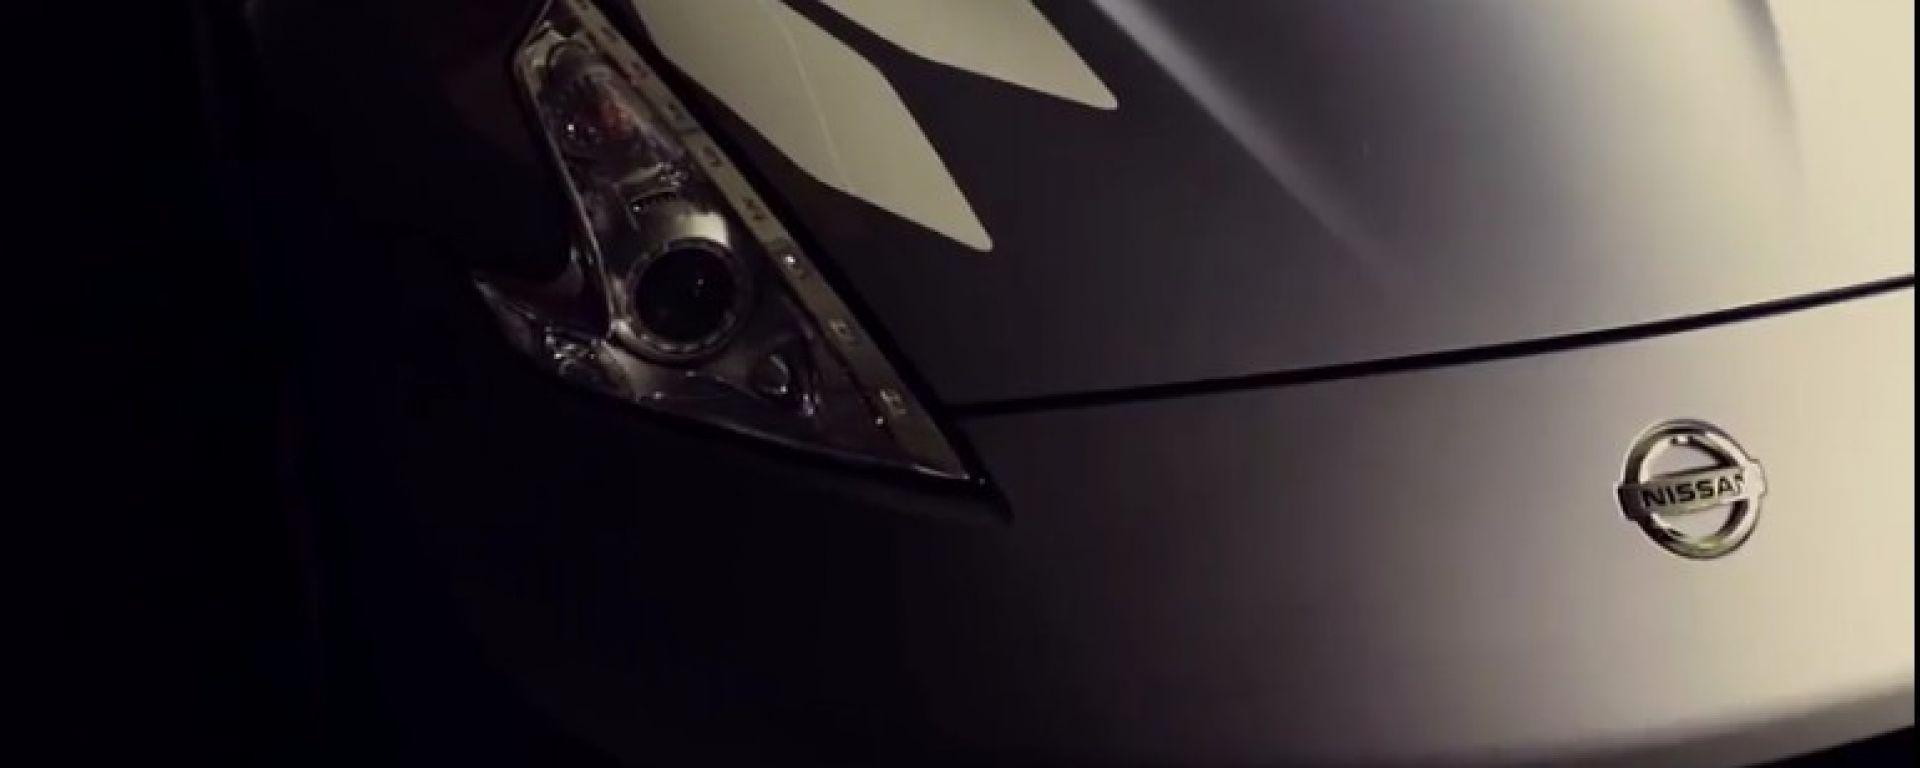 Nissan Project 370Z